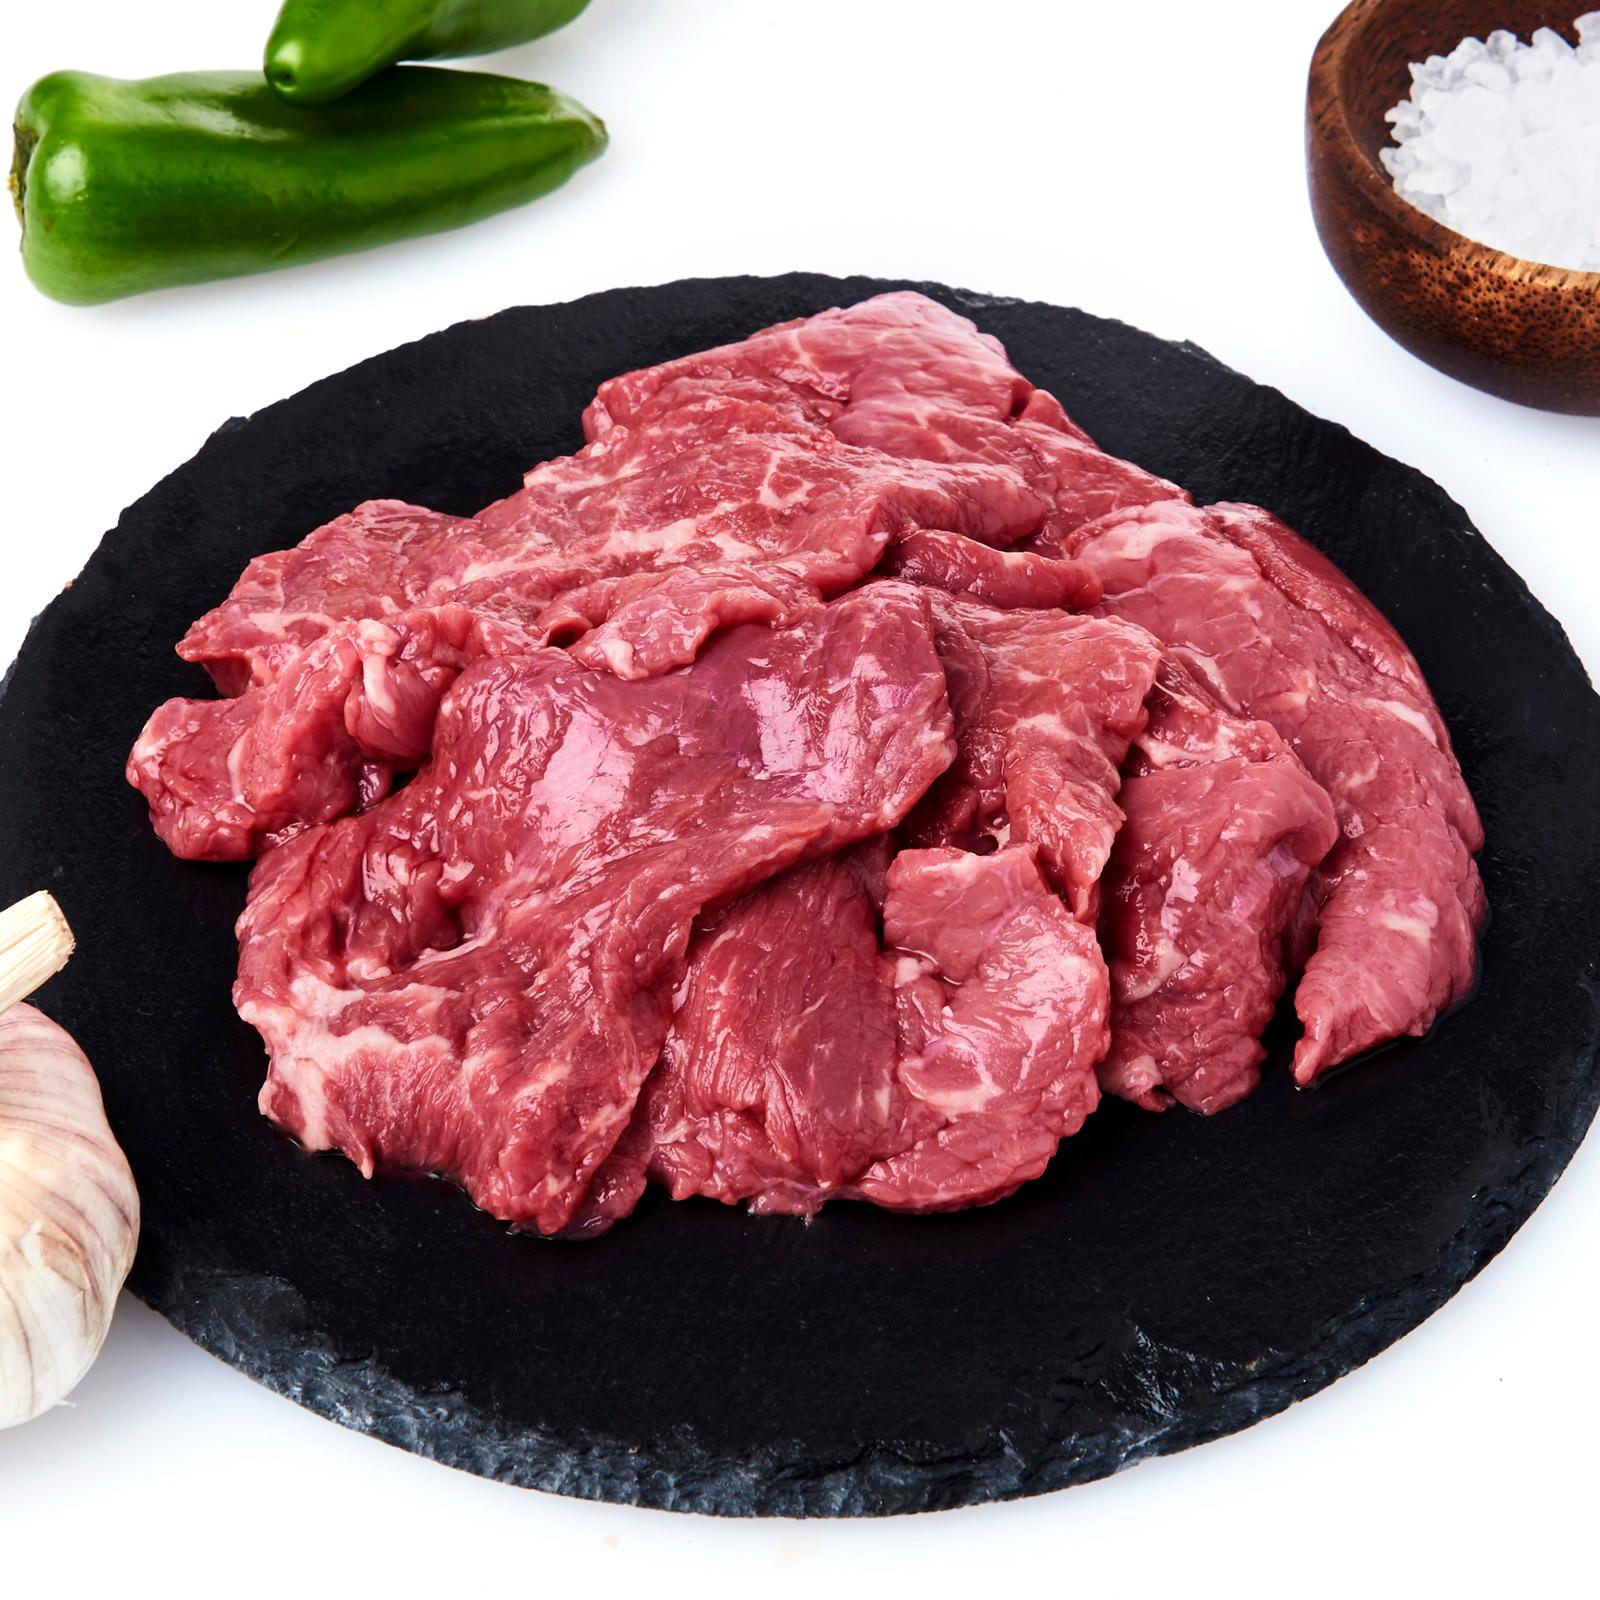 Meat Co. Premium Australian 100 Day Grain Fed Beef Stir Fry